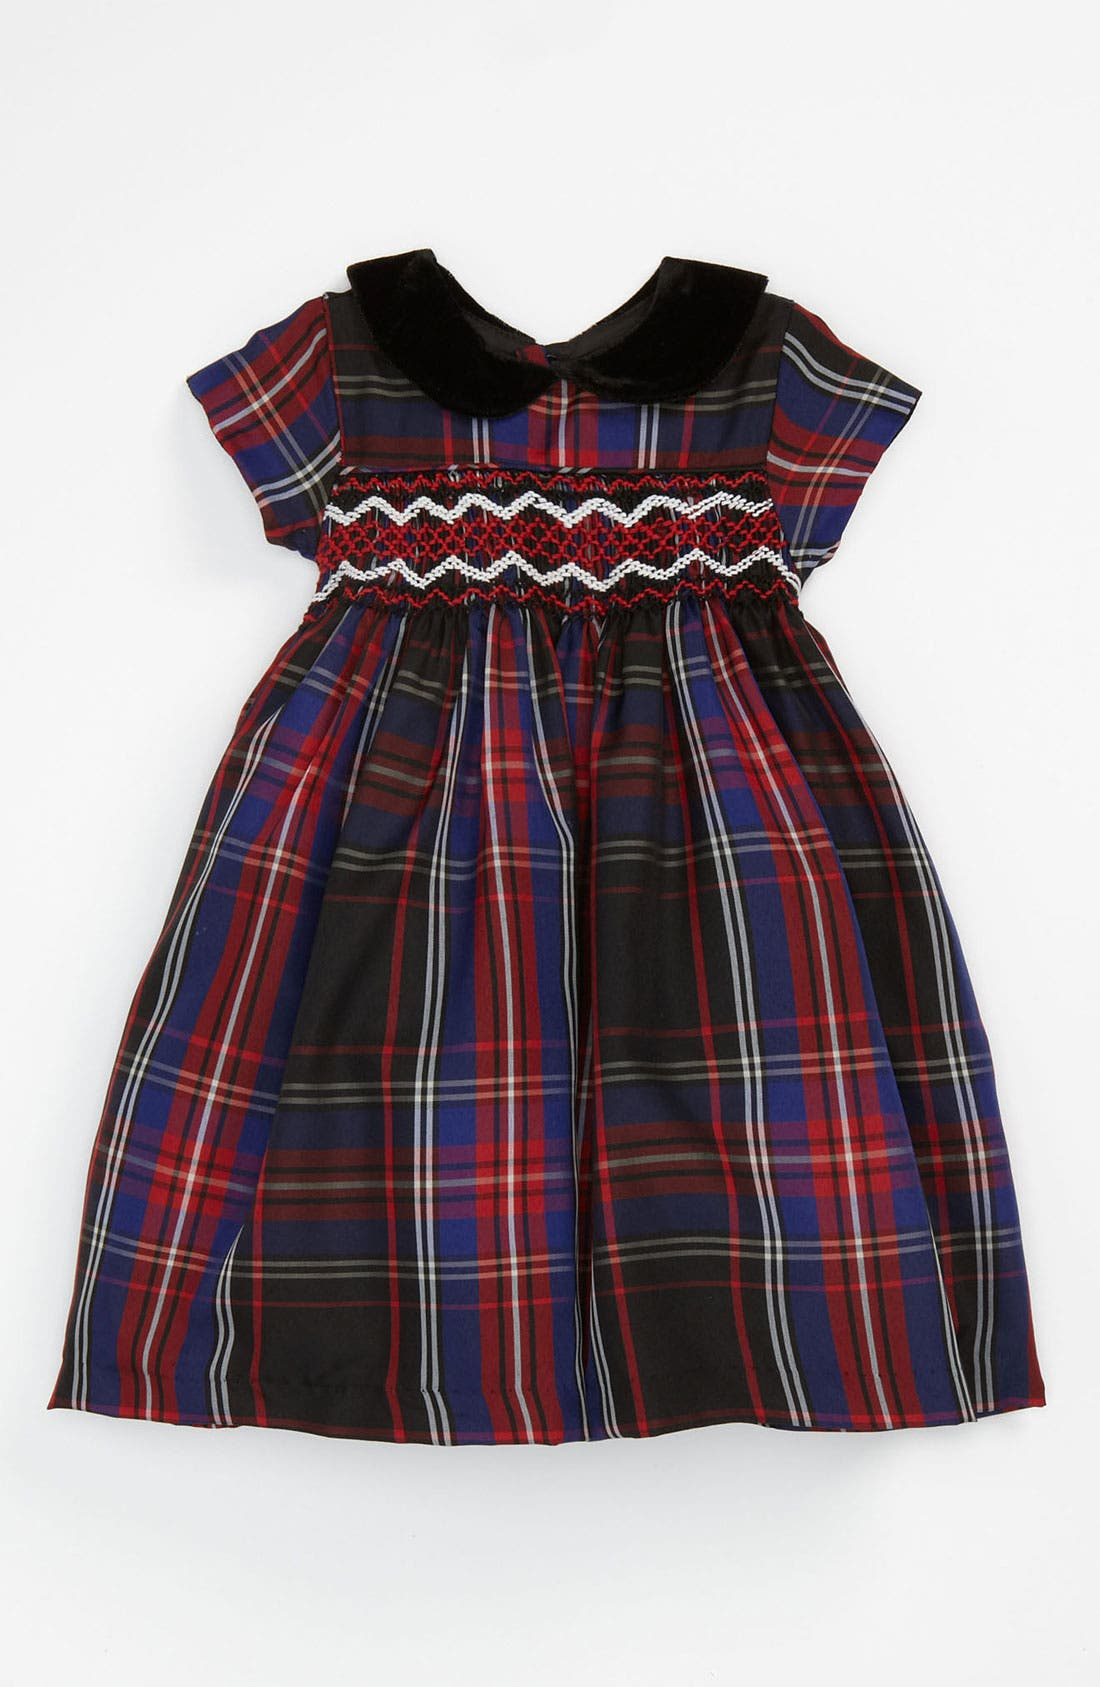 Main Image - Laura Ashley Plaid Dress (Toddler)